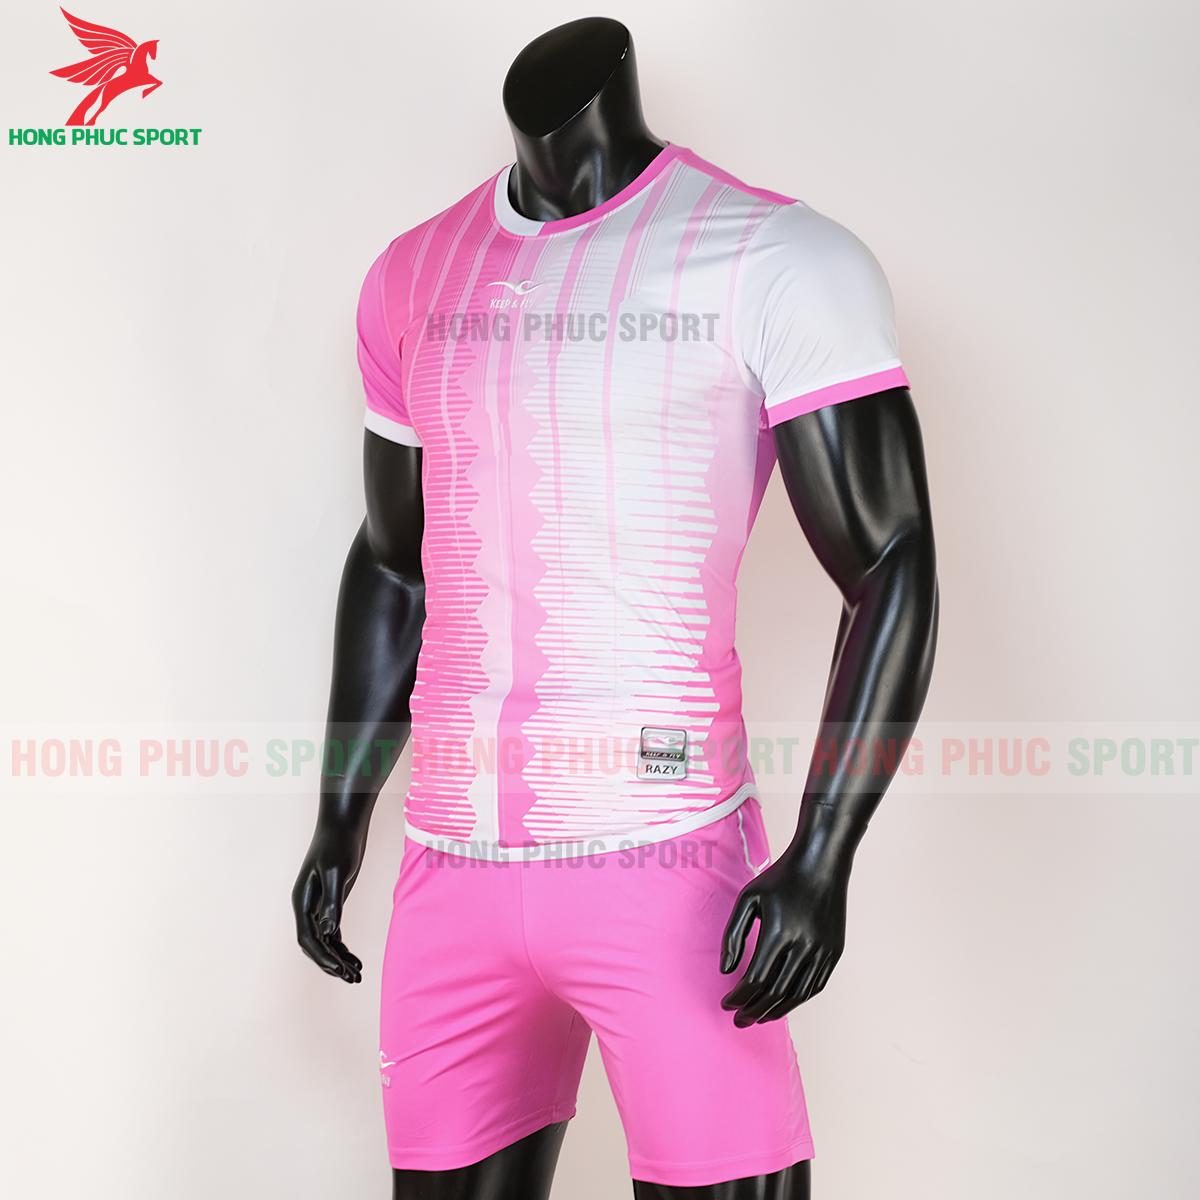 https://cdn.hongphucsport.com/unsafe/s4.shopbay.vn/files/285/ao-bong-da-keep-fly-razy-hong-trang-trai-5f7196ec04592.png